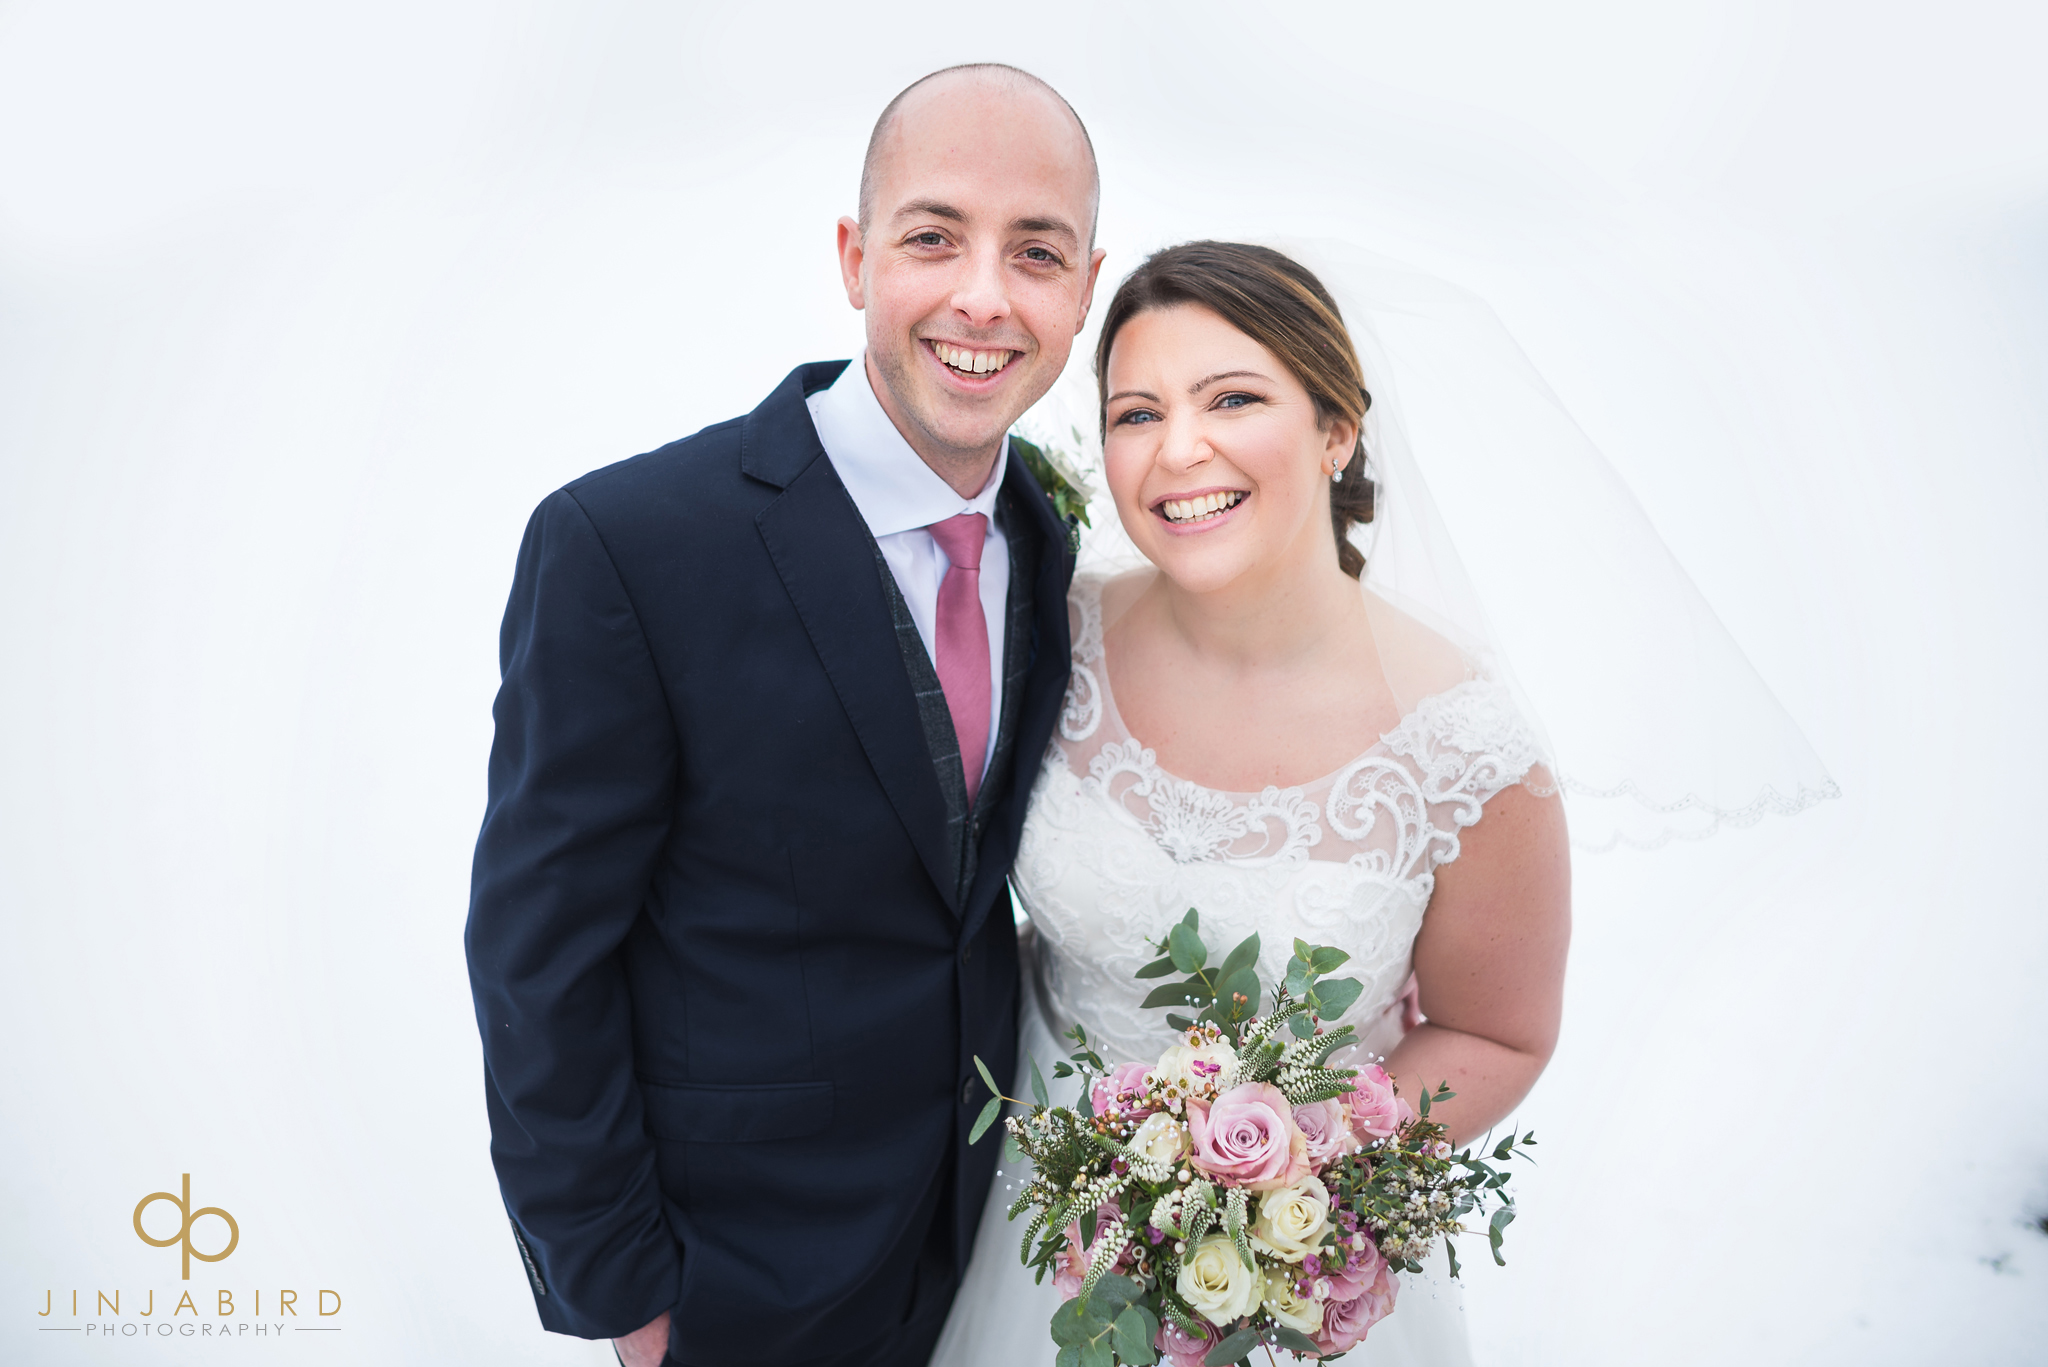 snowy-wedding-photo-bassmead-manor